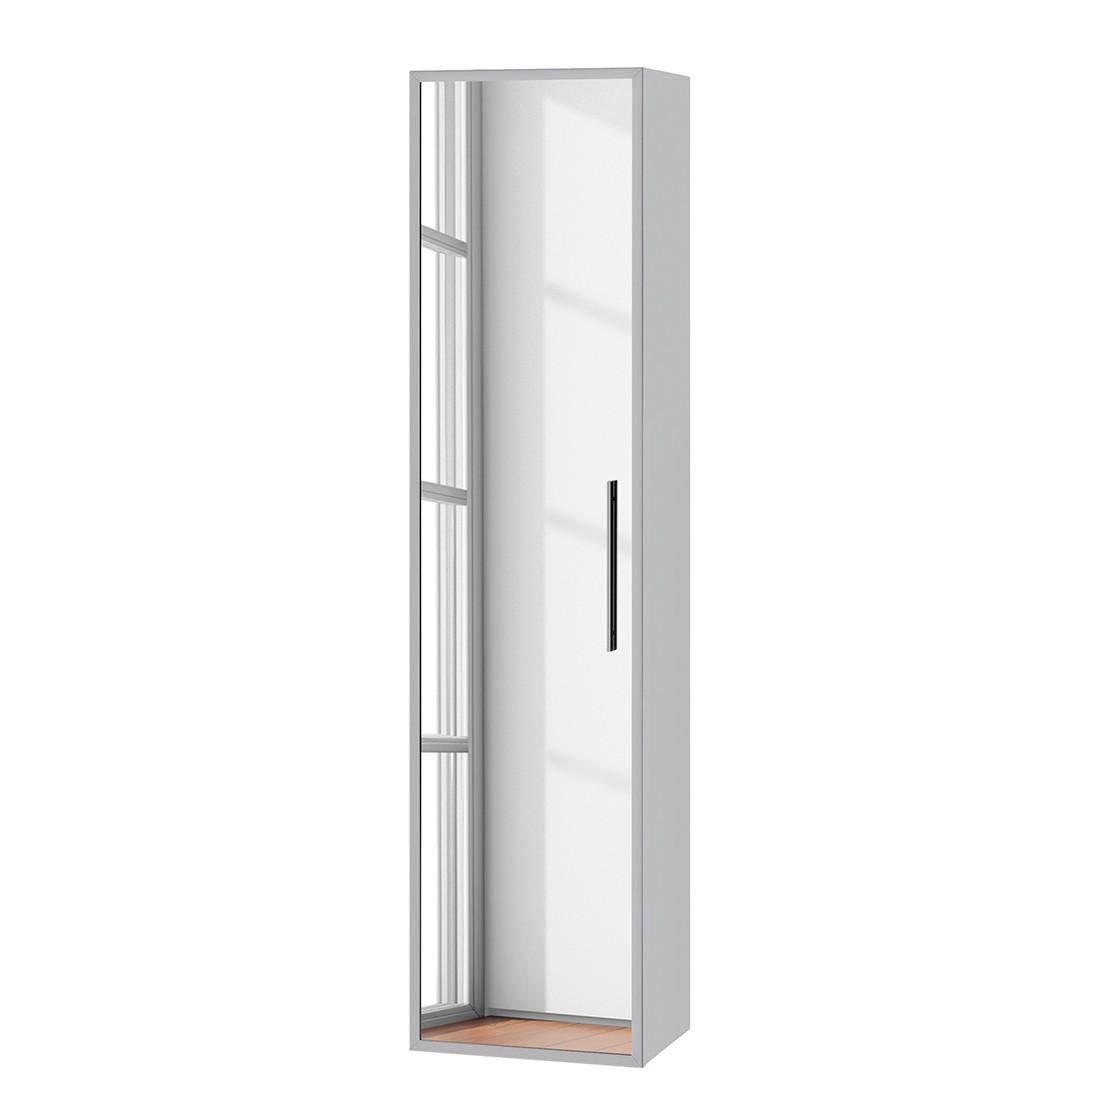 M bel online g nstig kaufen ber shop24 for Schuhschrank aluminium